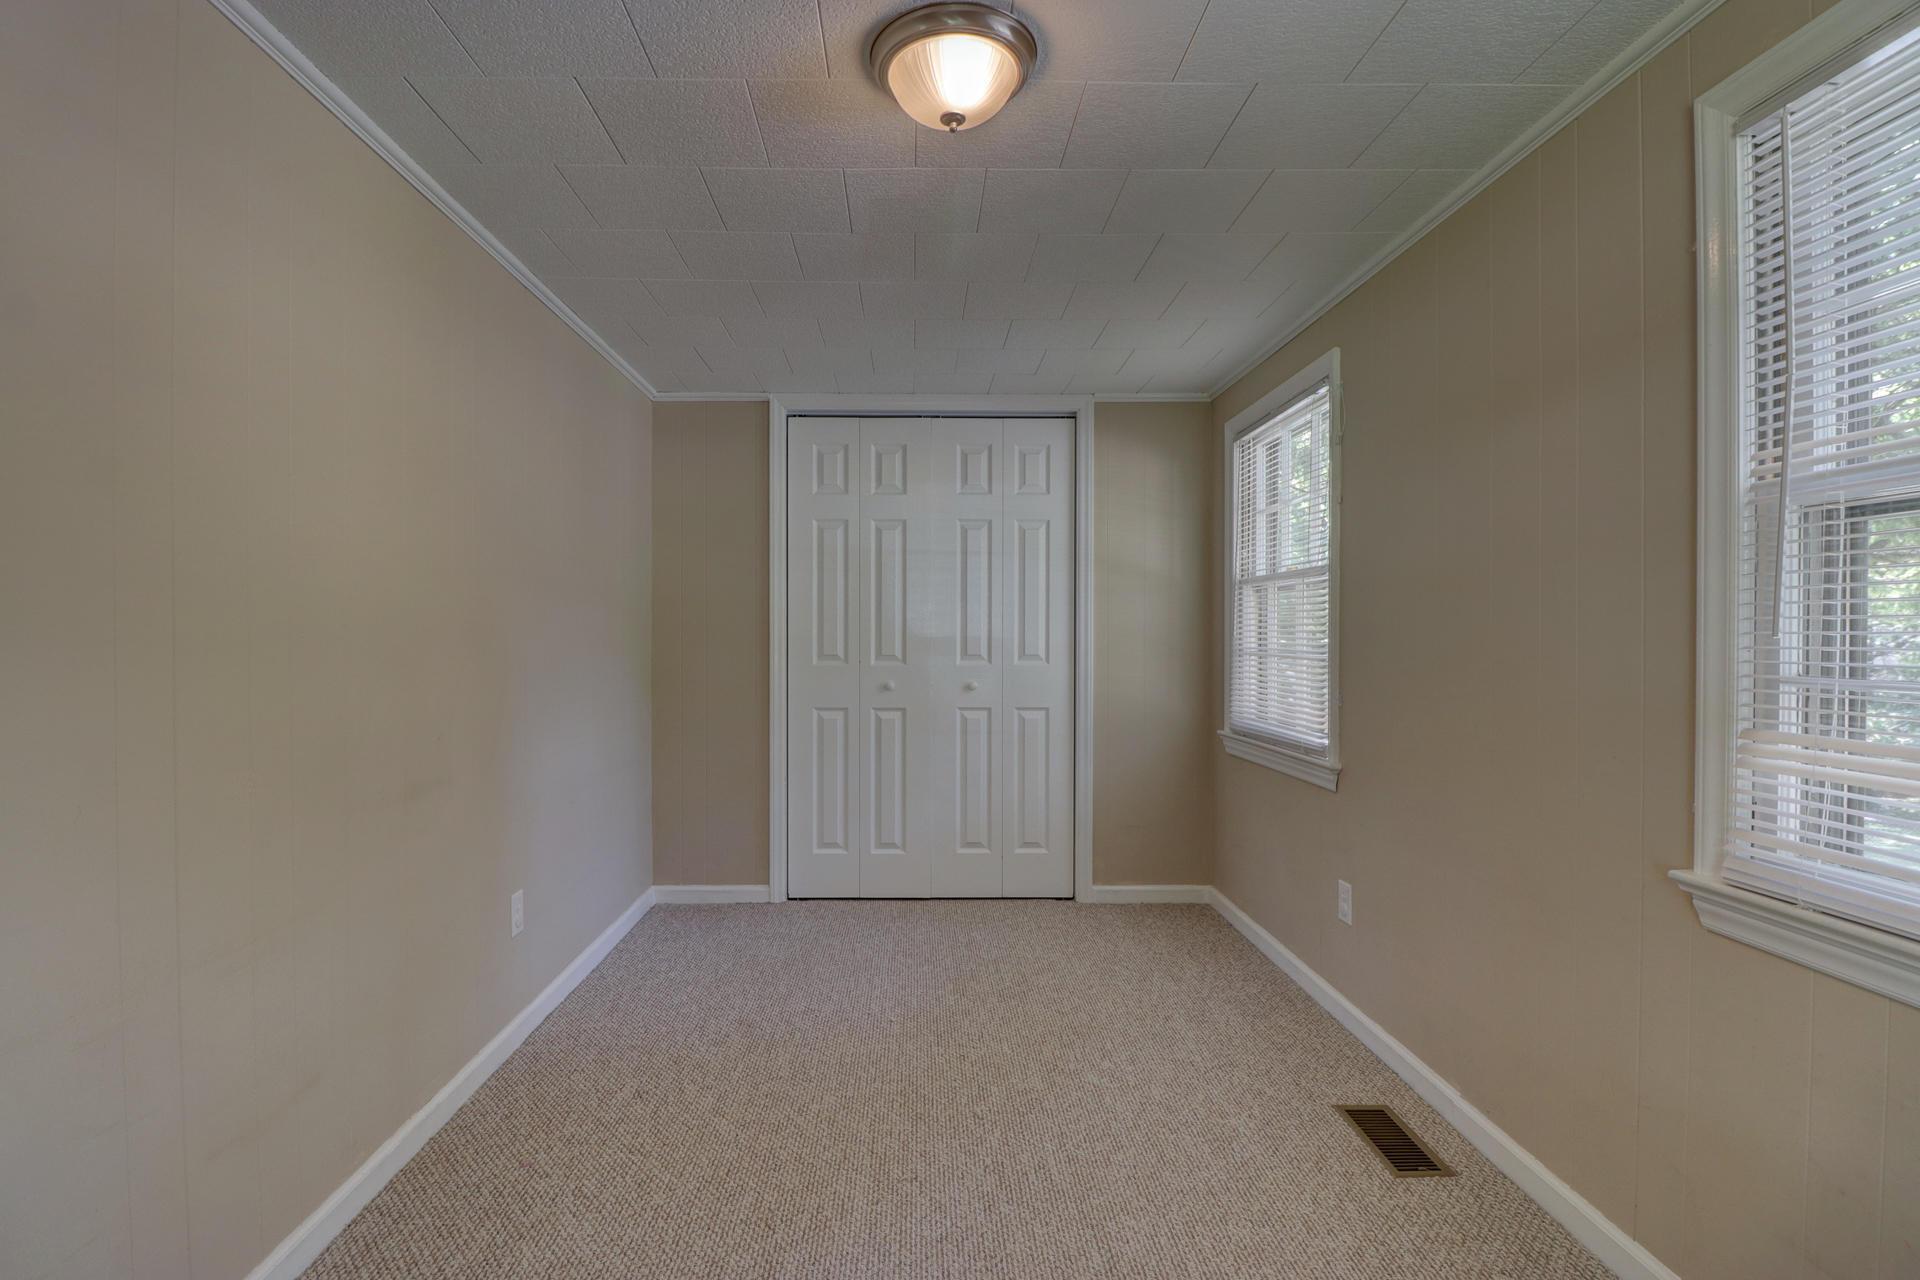 hardwood floor installation roanoke va of listing 826 windsor ave sw roanoke va mls 852075 marie intended for property photo property photo property photo property photo